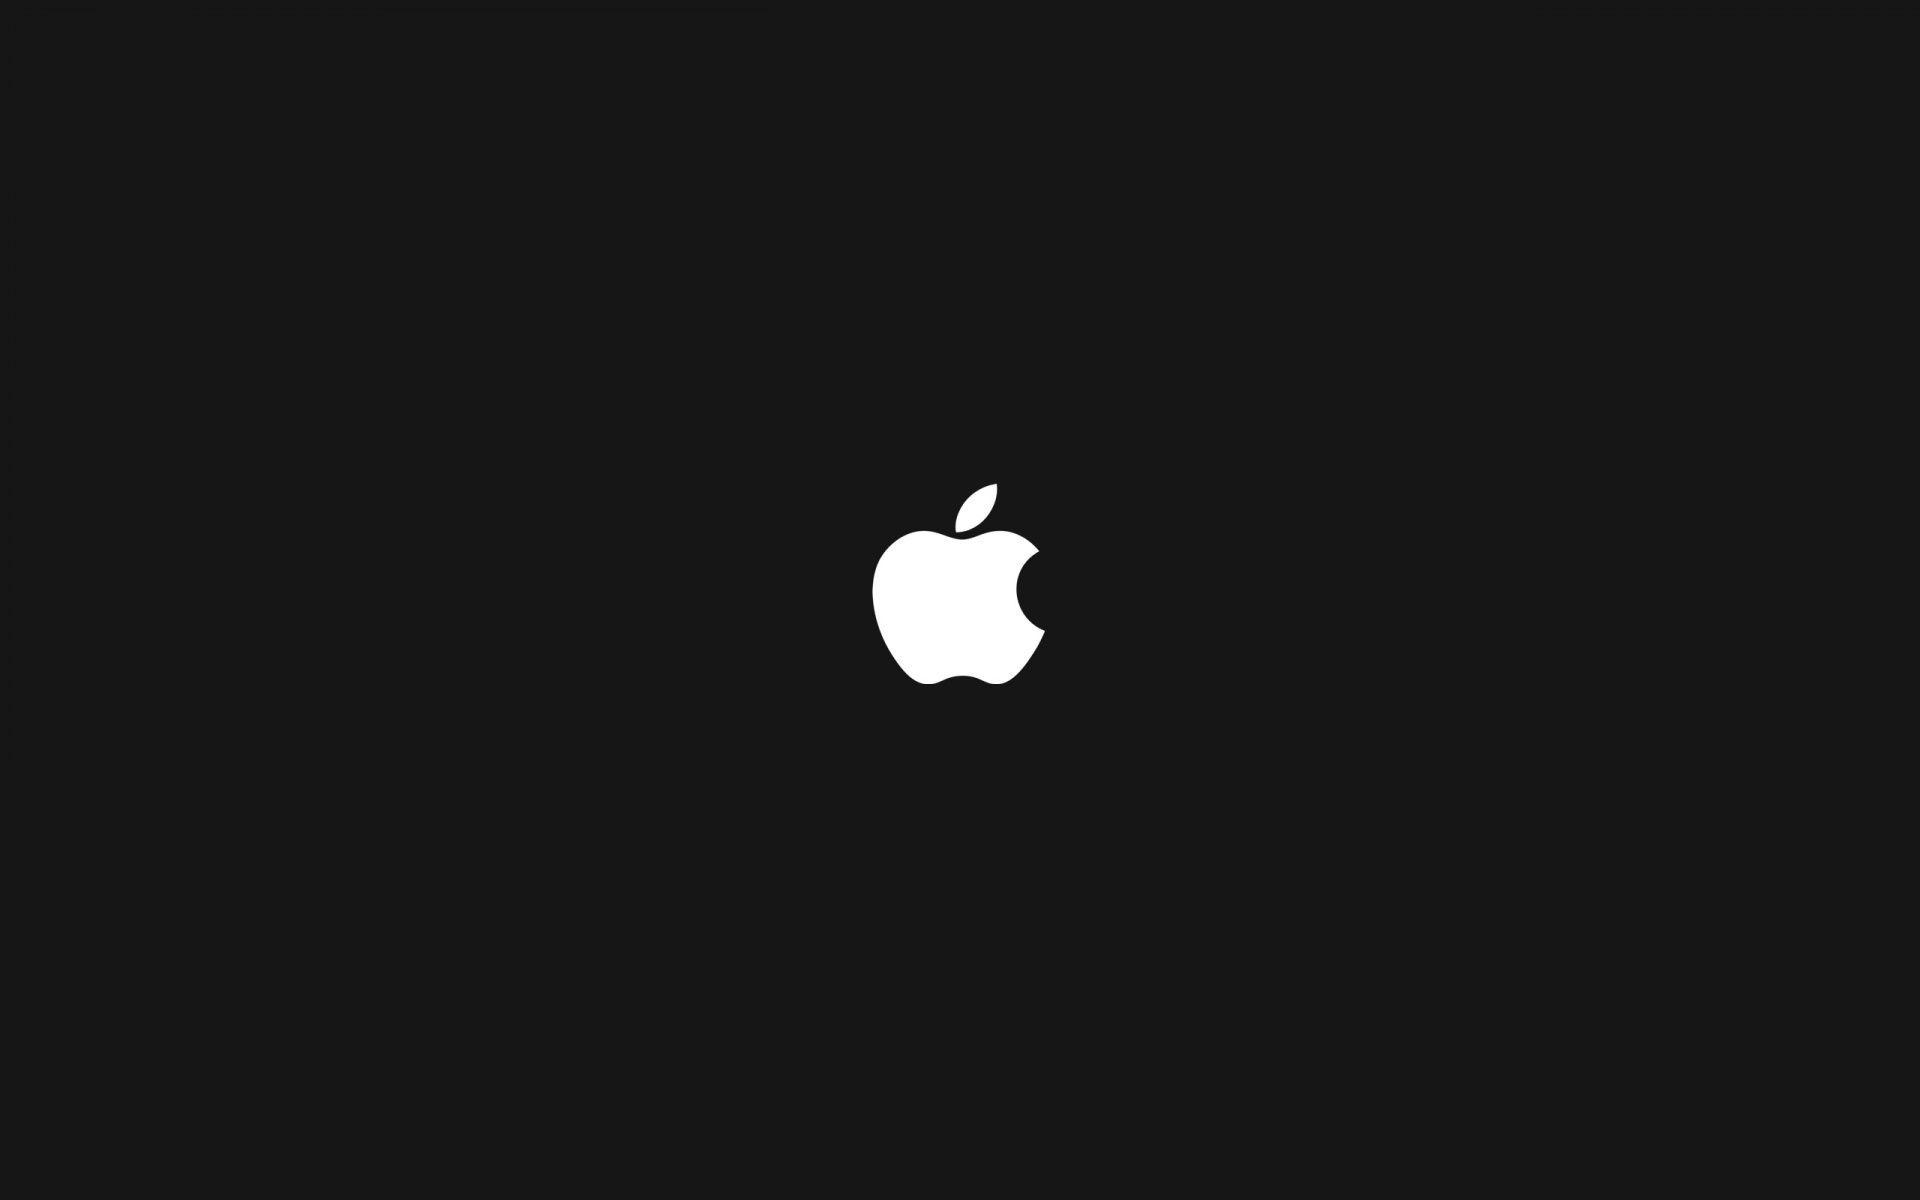 Black Apple Wallpapers Top Free Black Apple Backgrounds